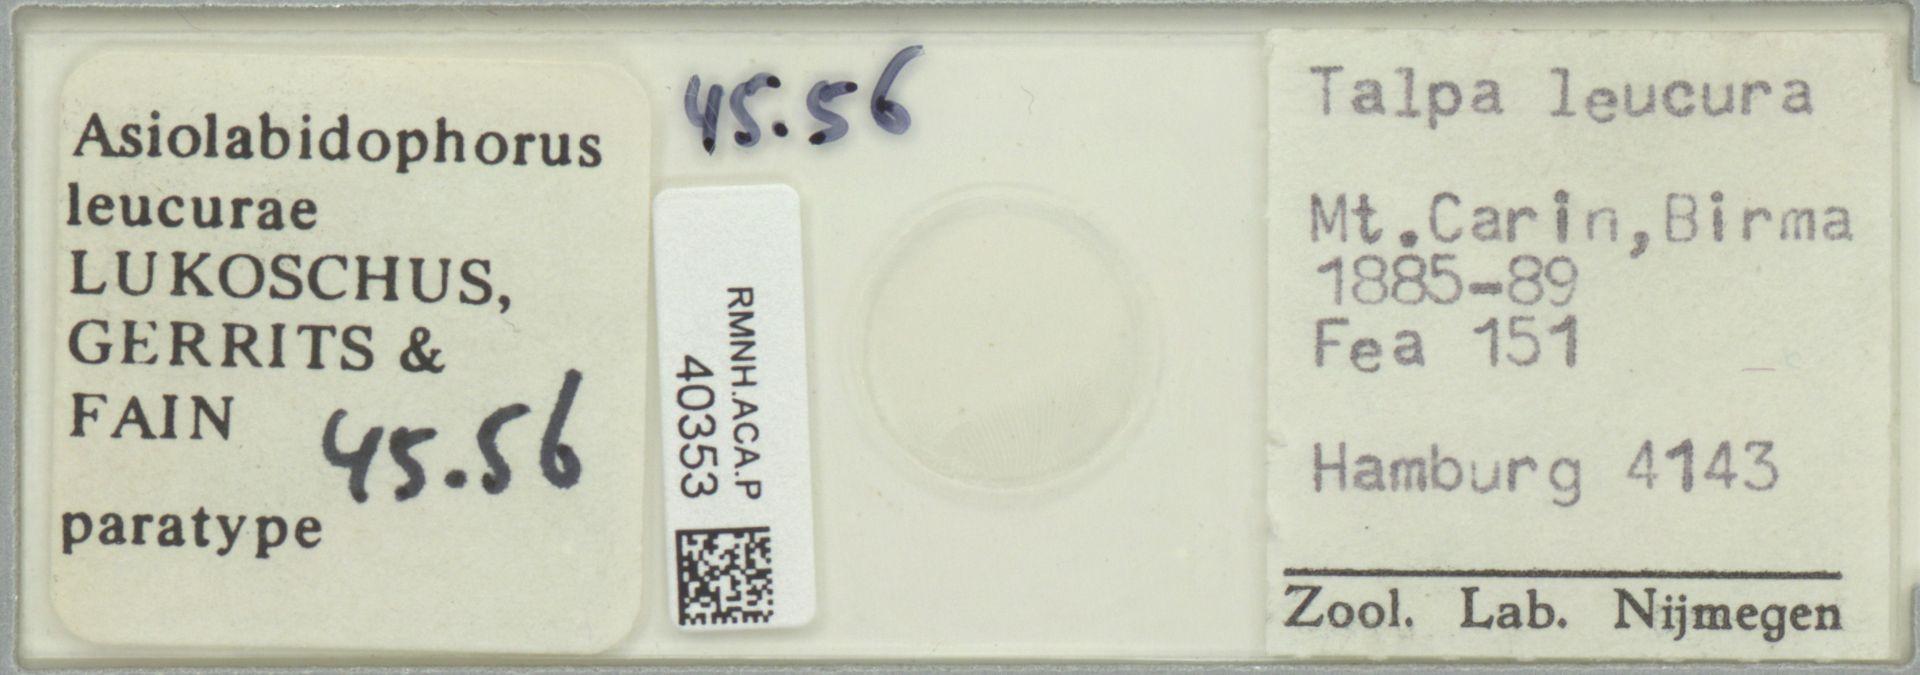 RMNH.ACA.P.40353 | Asiolabidophorus leucurae Lukoschus, Gerrits & Fain